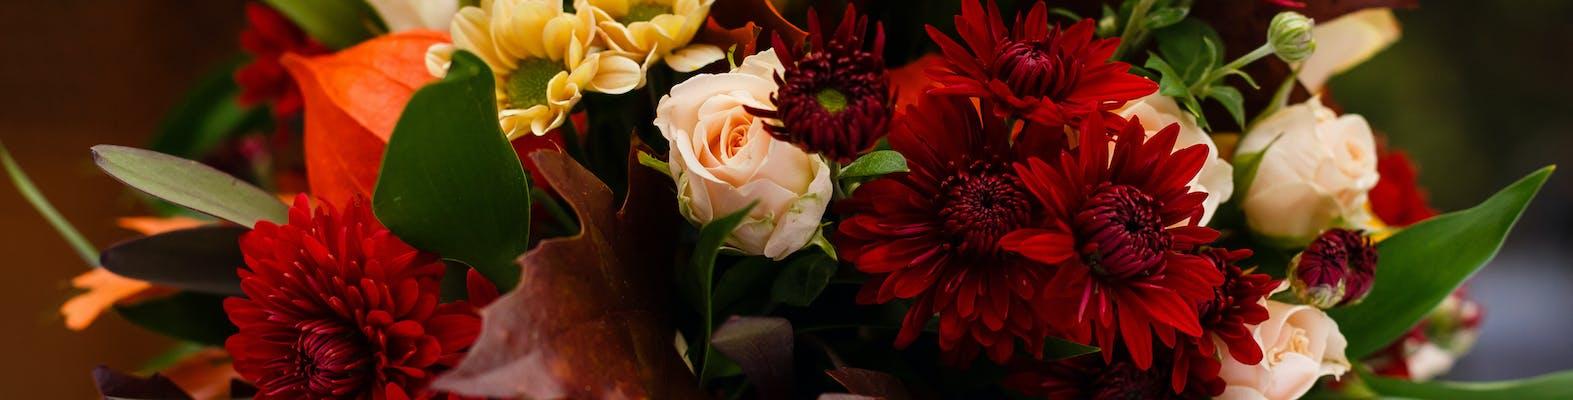 Shotwell Floral Flower Delivery Fargo Nd Florist